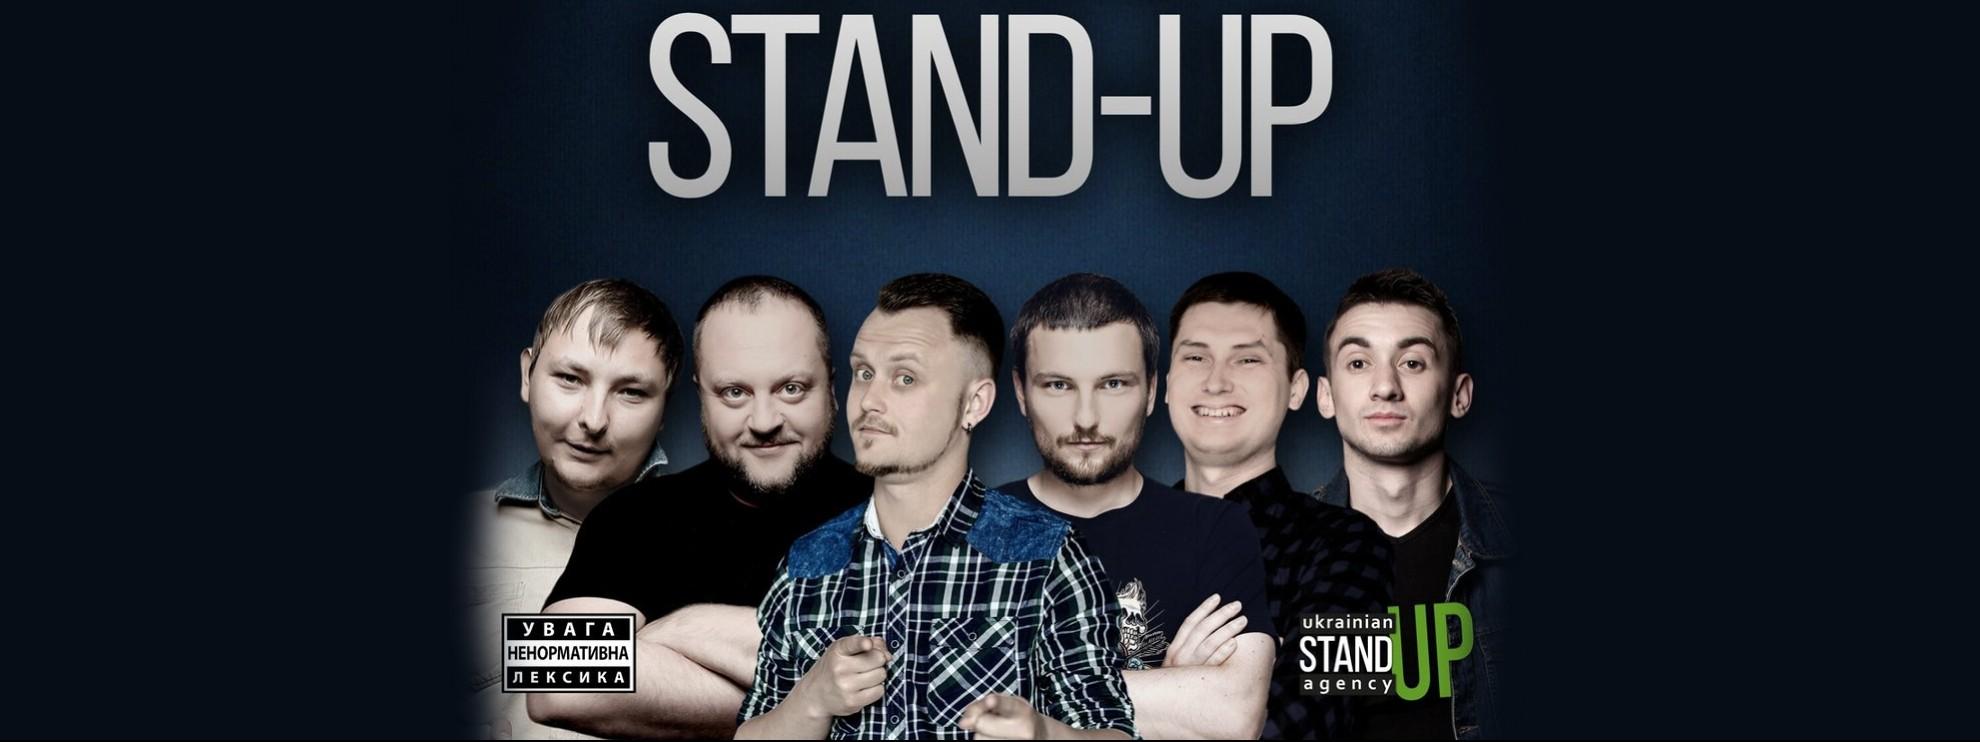 performer Ukrainian Stand-Up Agency